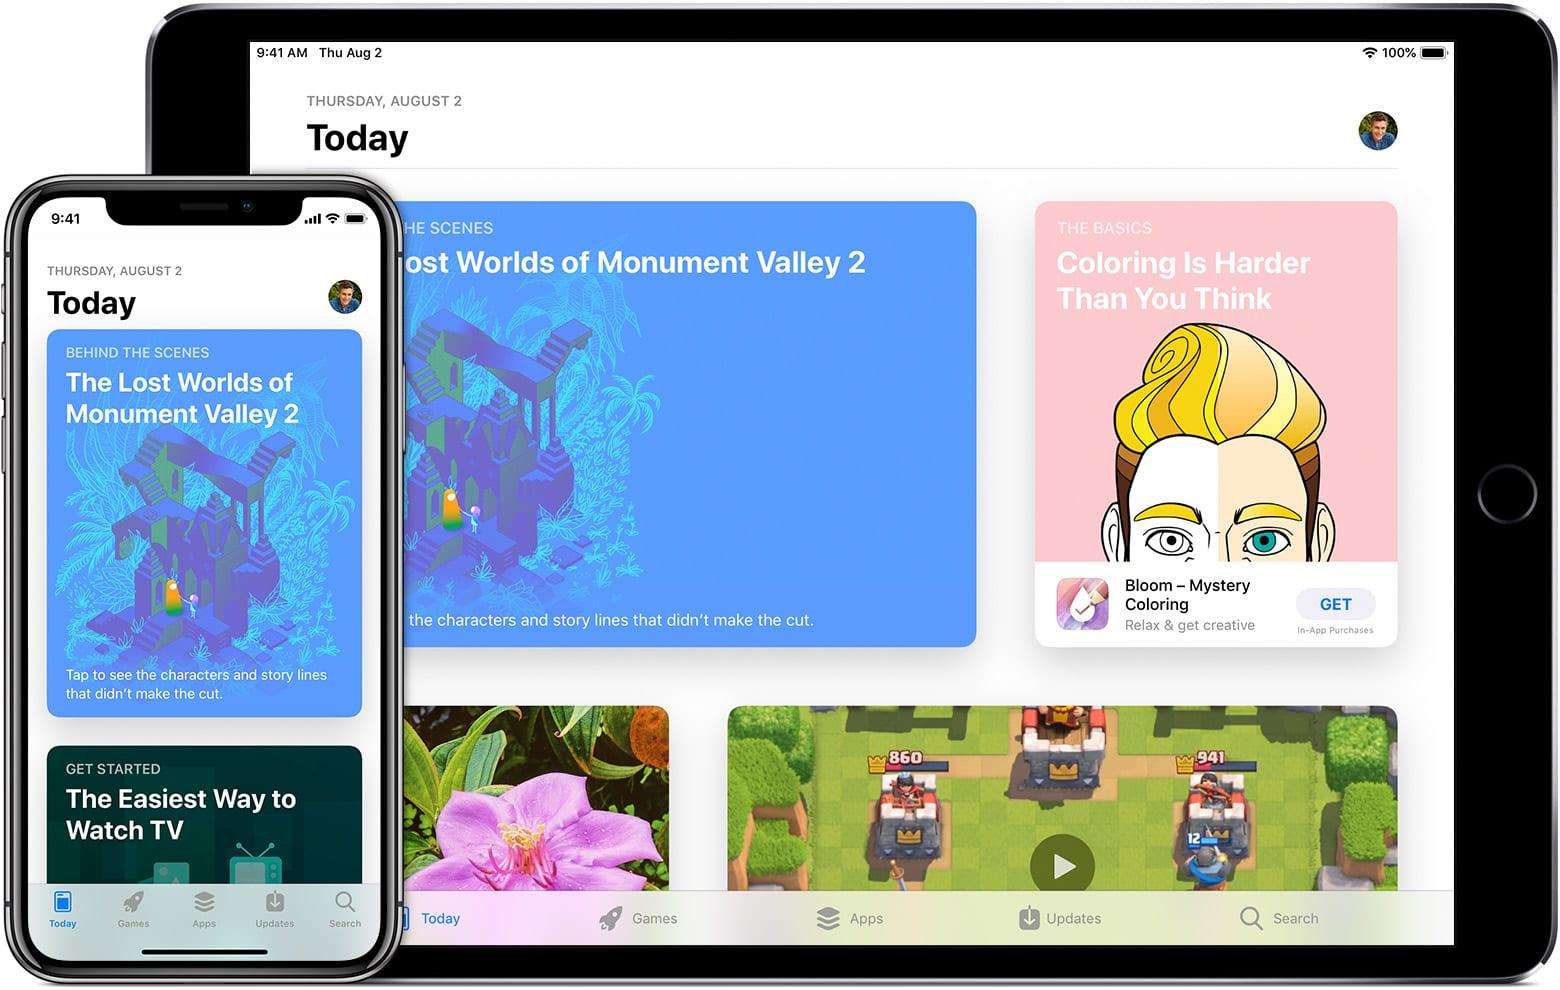 ios12 iphone x ipad pro app store today - App Store trápia podvodníci s predplatným